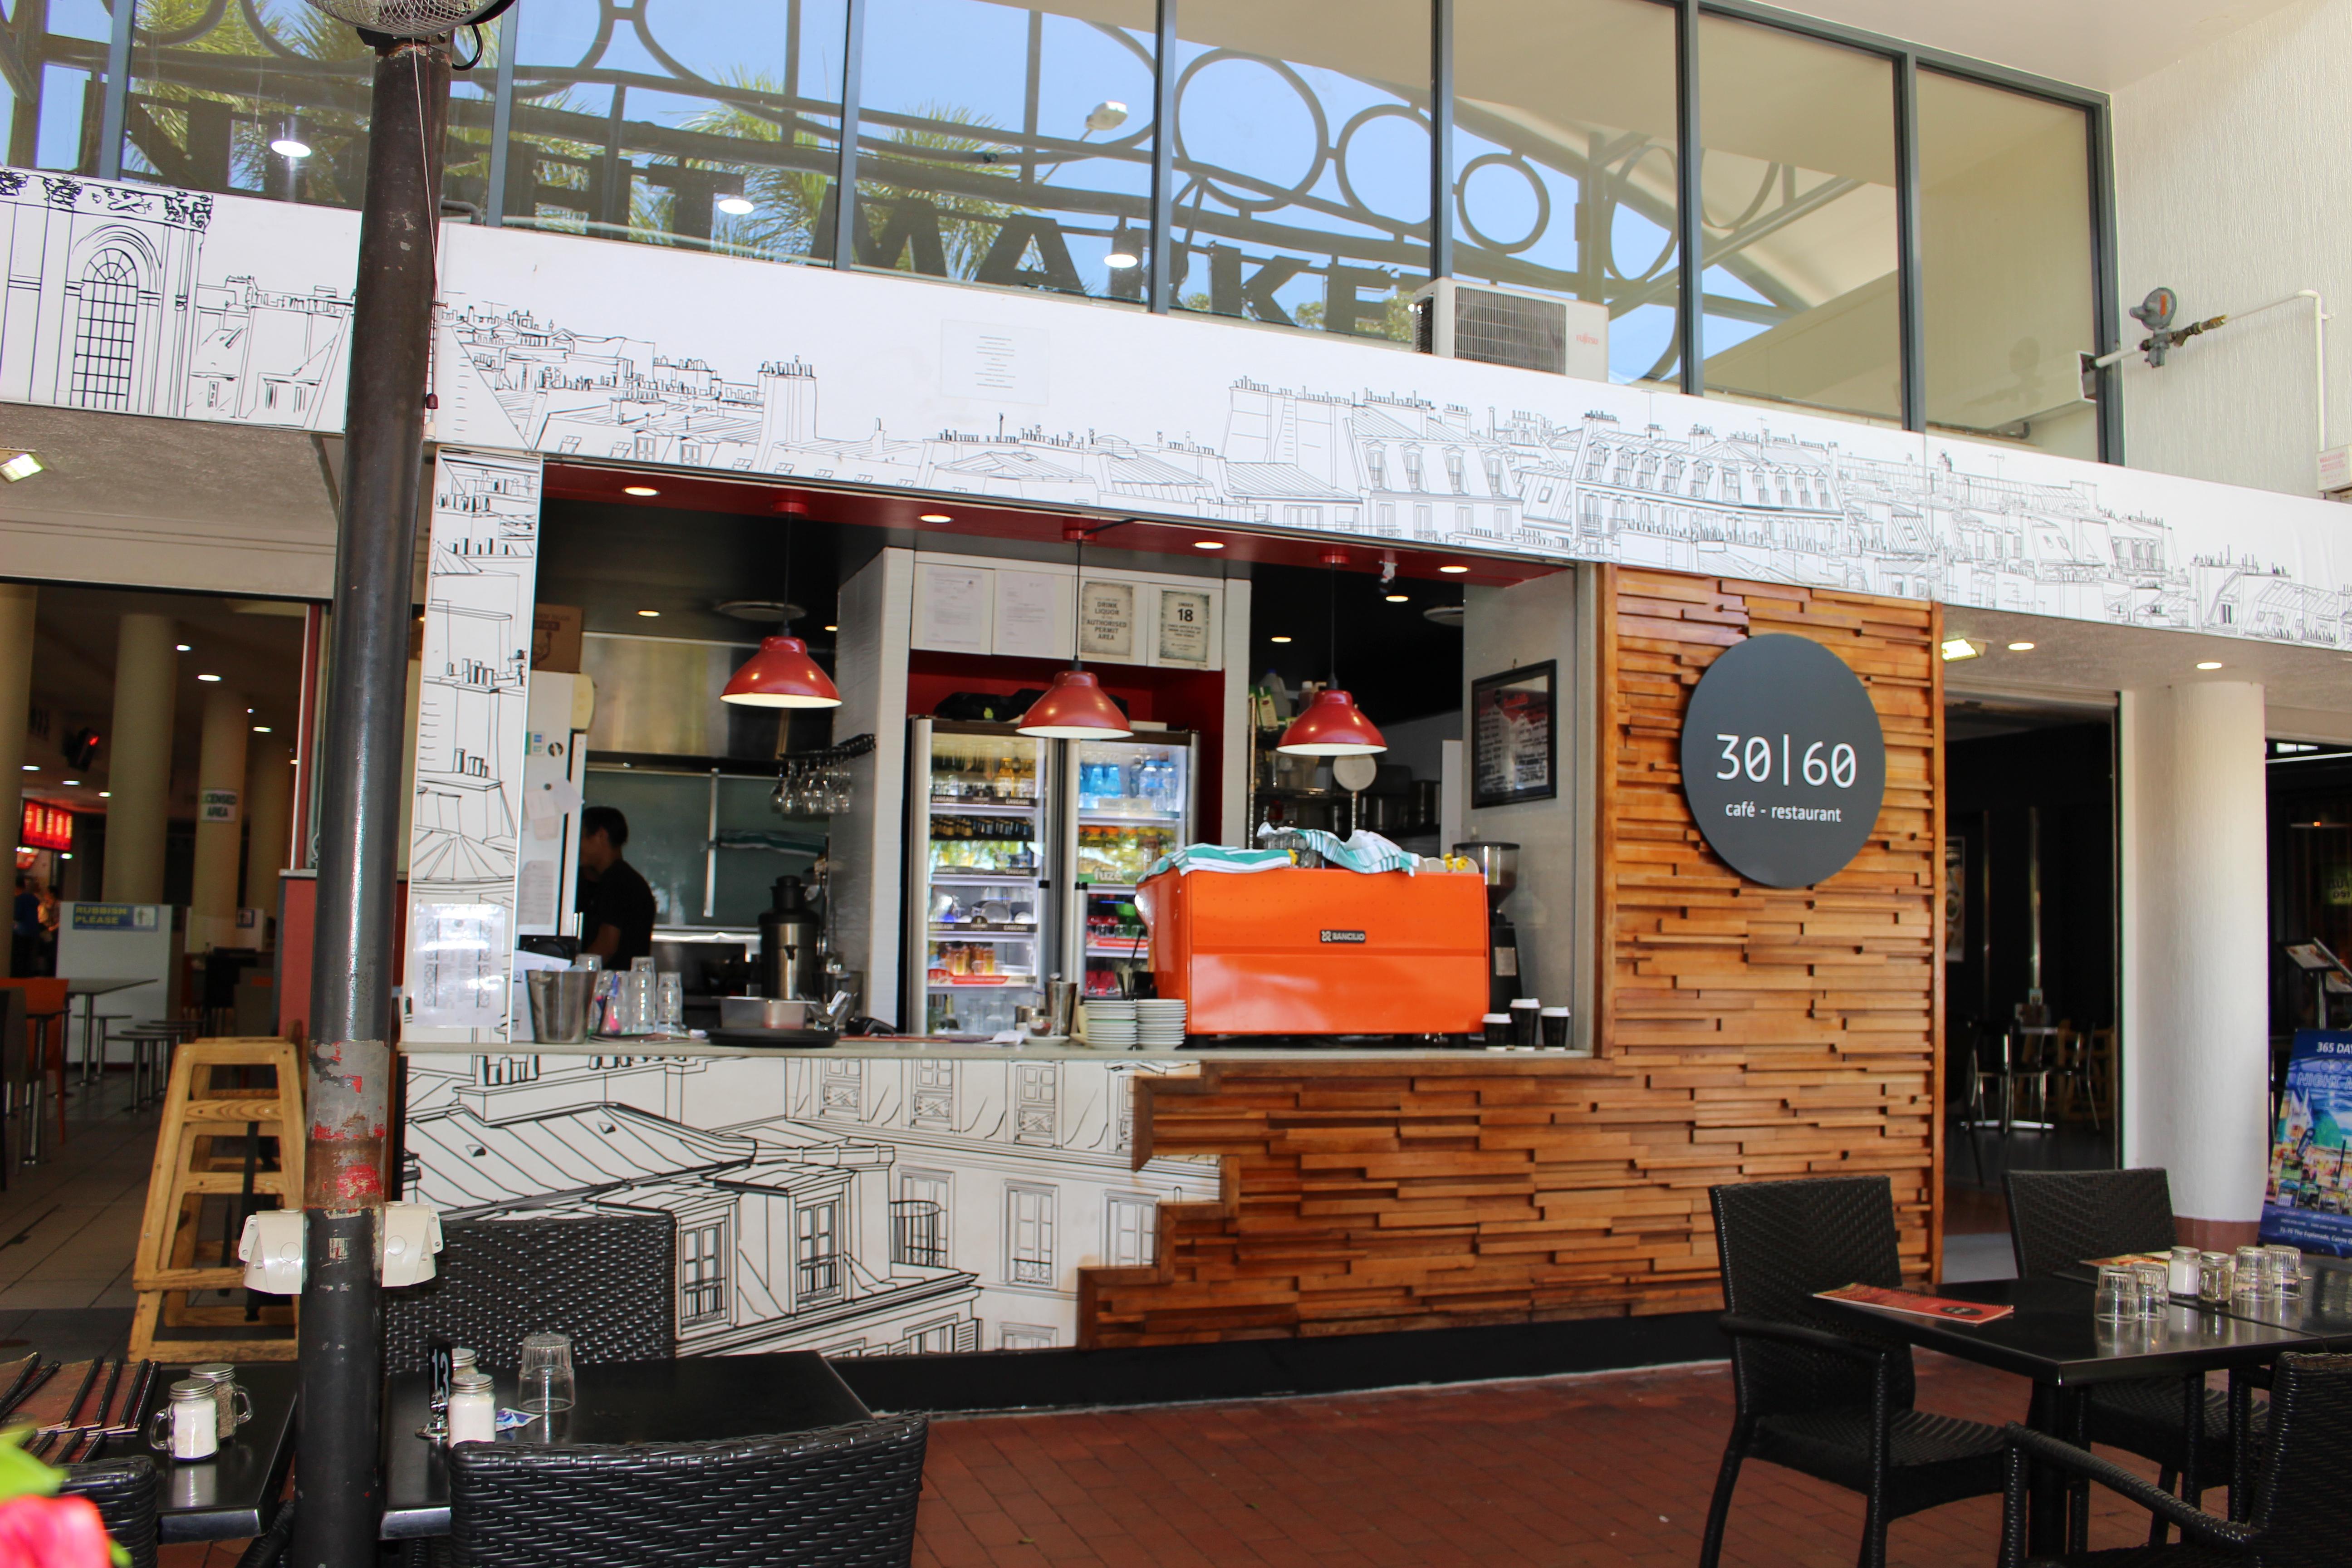 3060 Cafe Restaurant